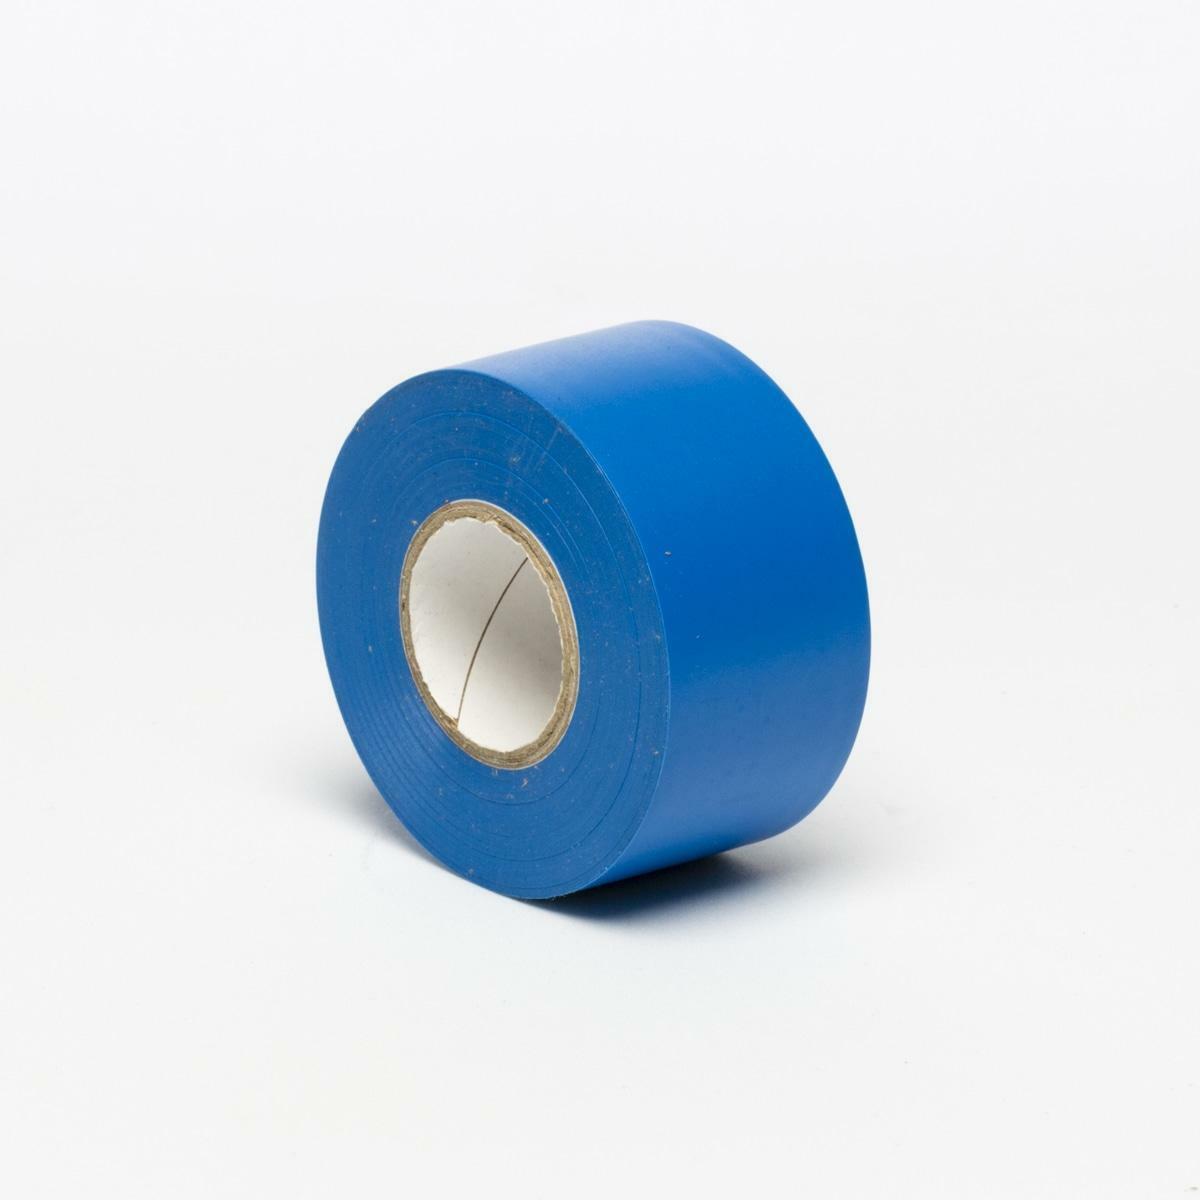 sixtus sixtus nastro dream fix 25mx4cm azzurro